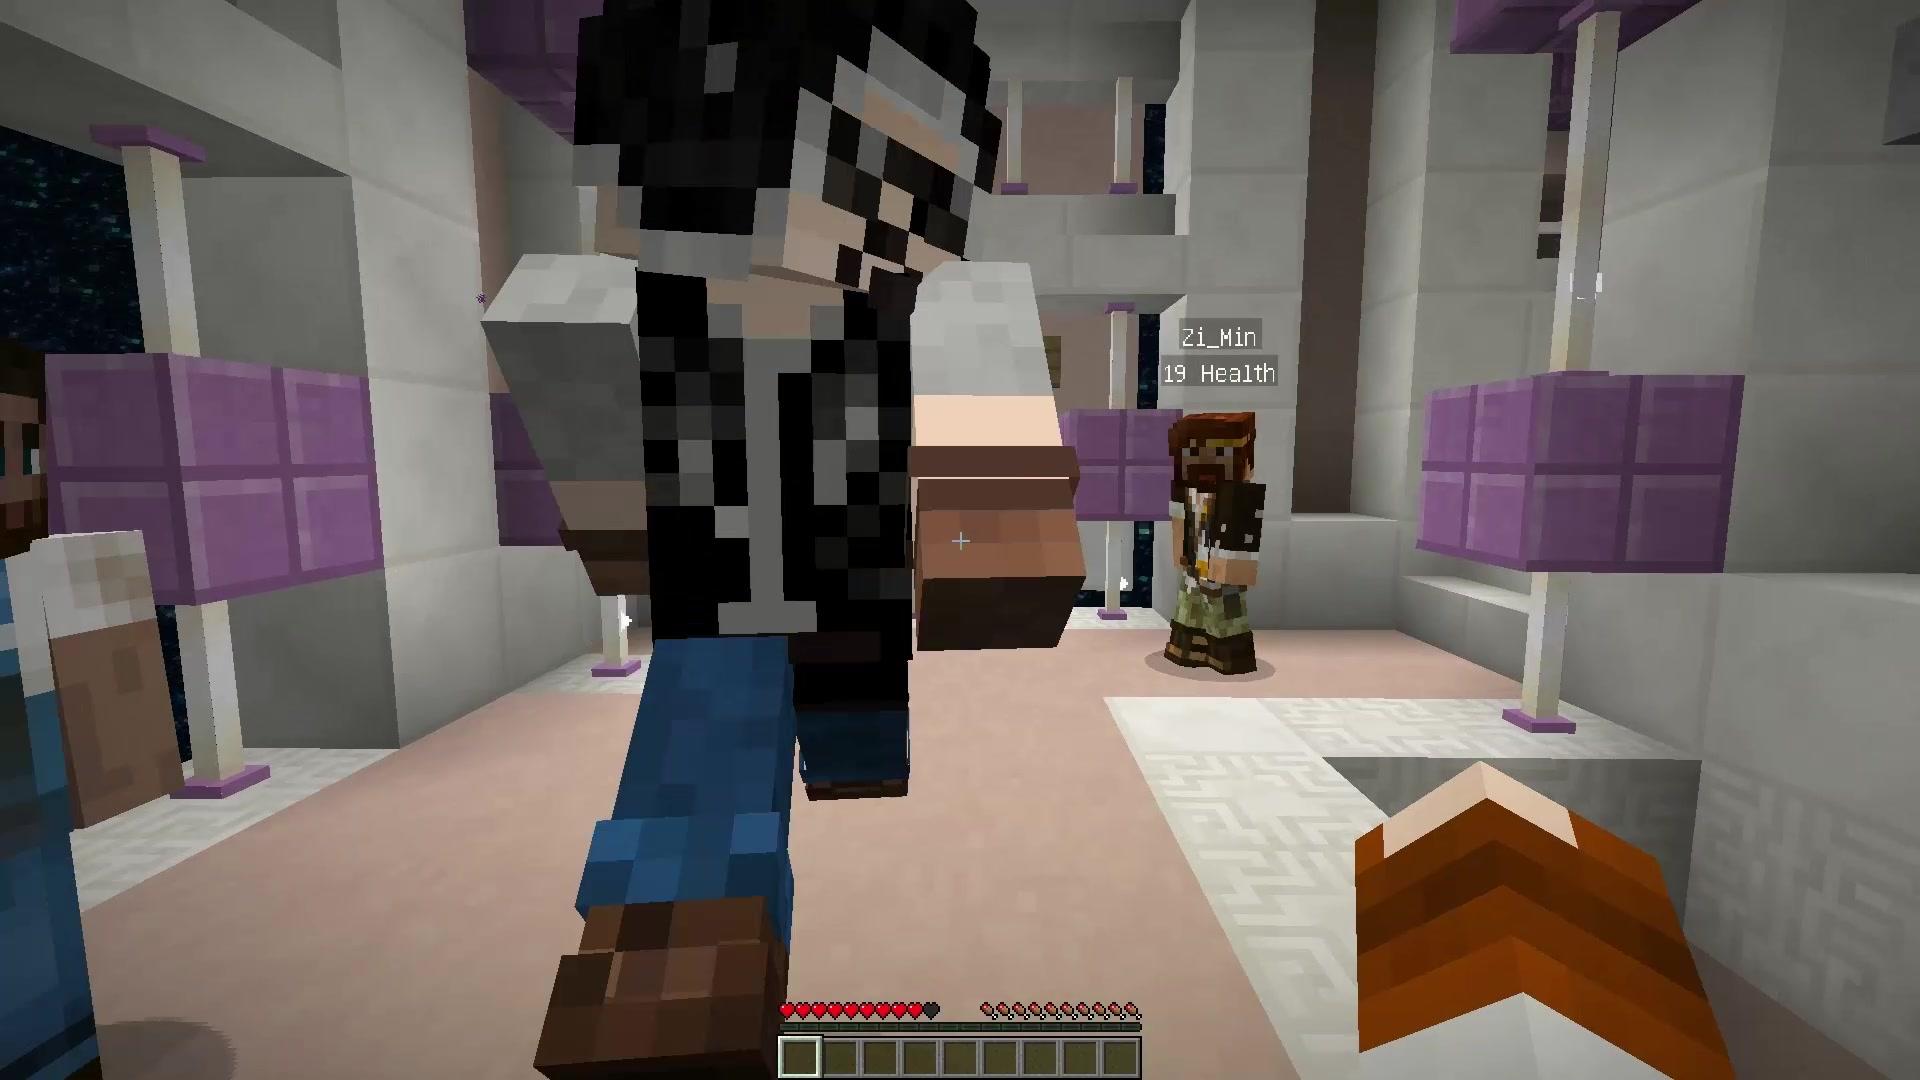 【Minecraft】《飞翔使和朋友们的多人游戏时间 1.12 王牌空战》